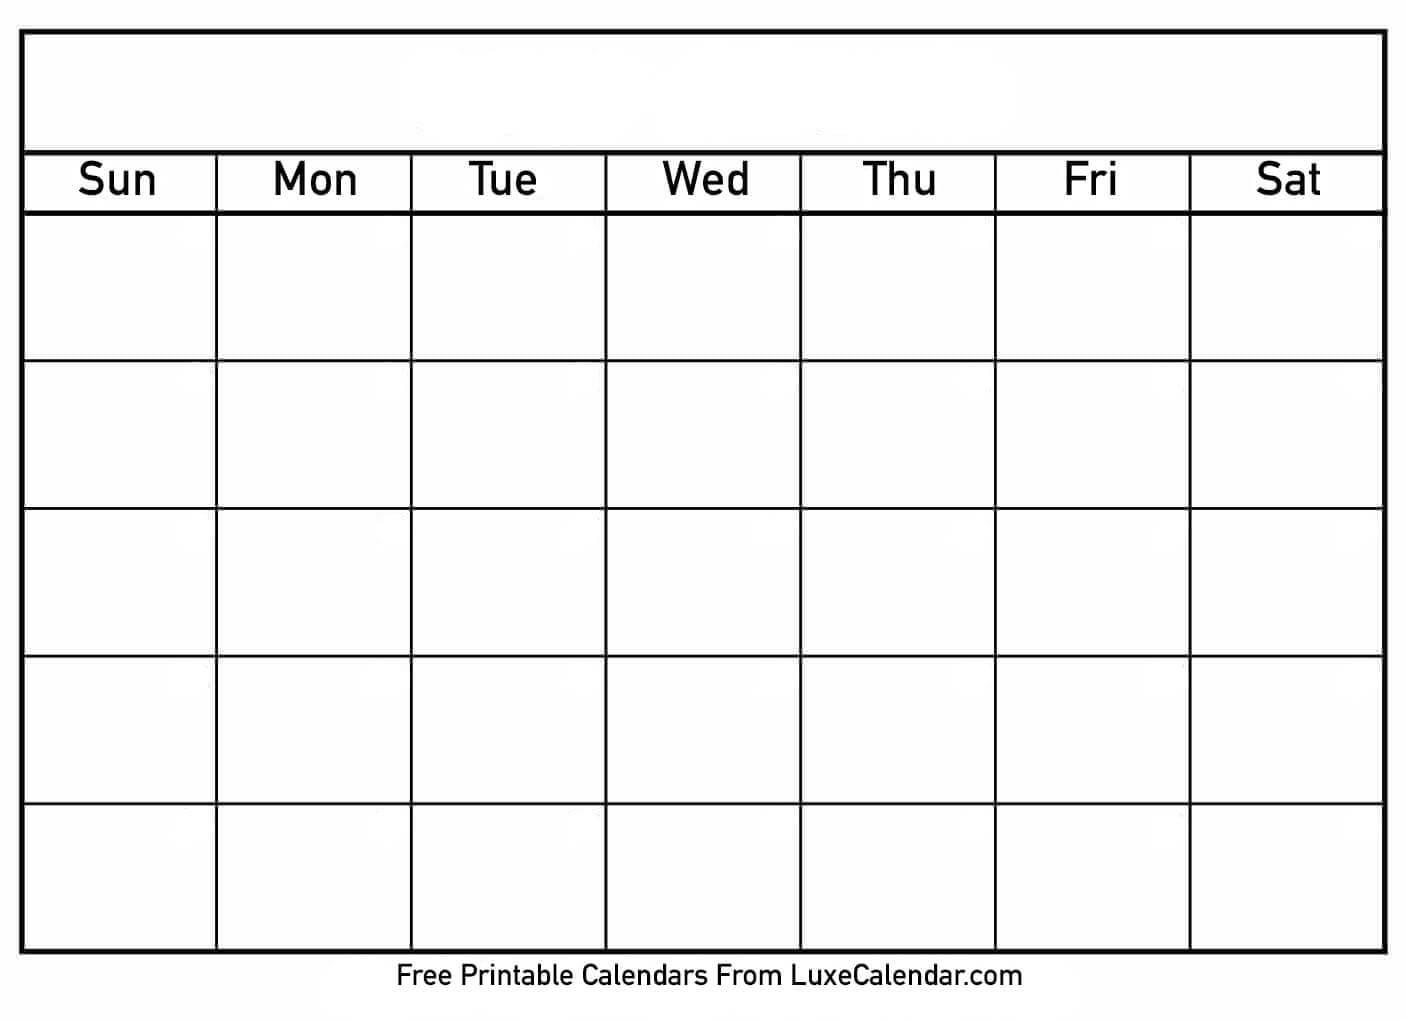 Printable Calendar Templates Full Page - Calendar within Full Page Blank Calendar Template